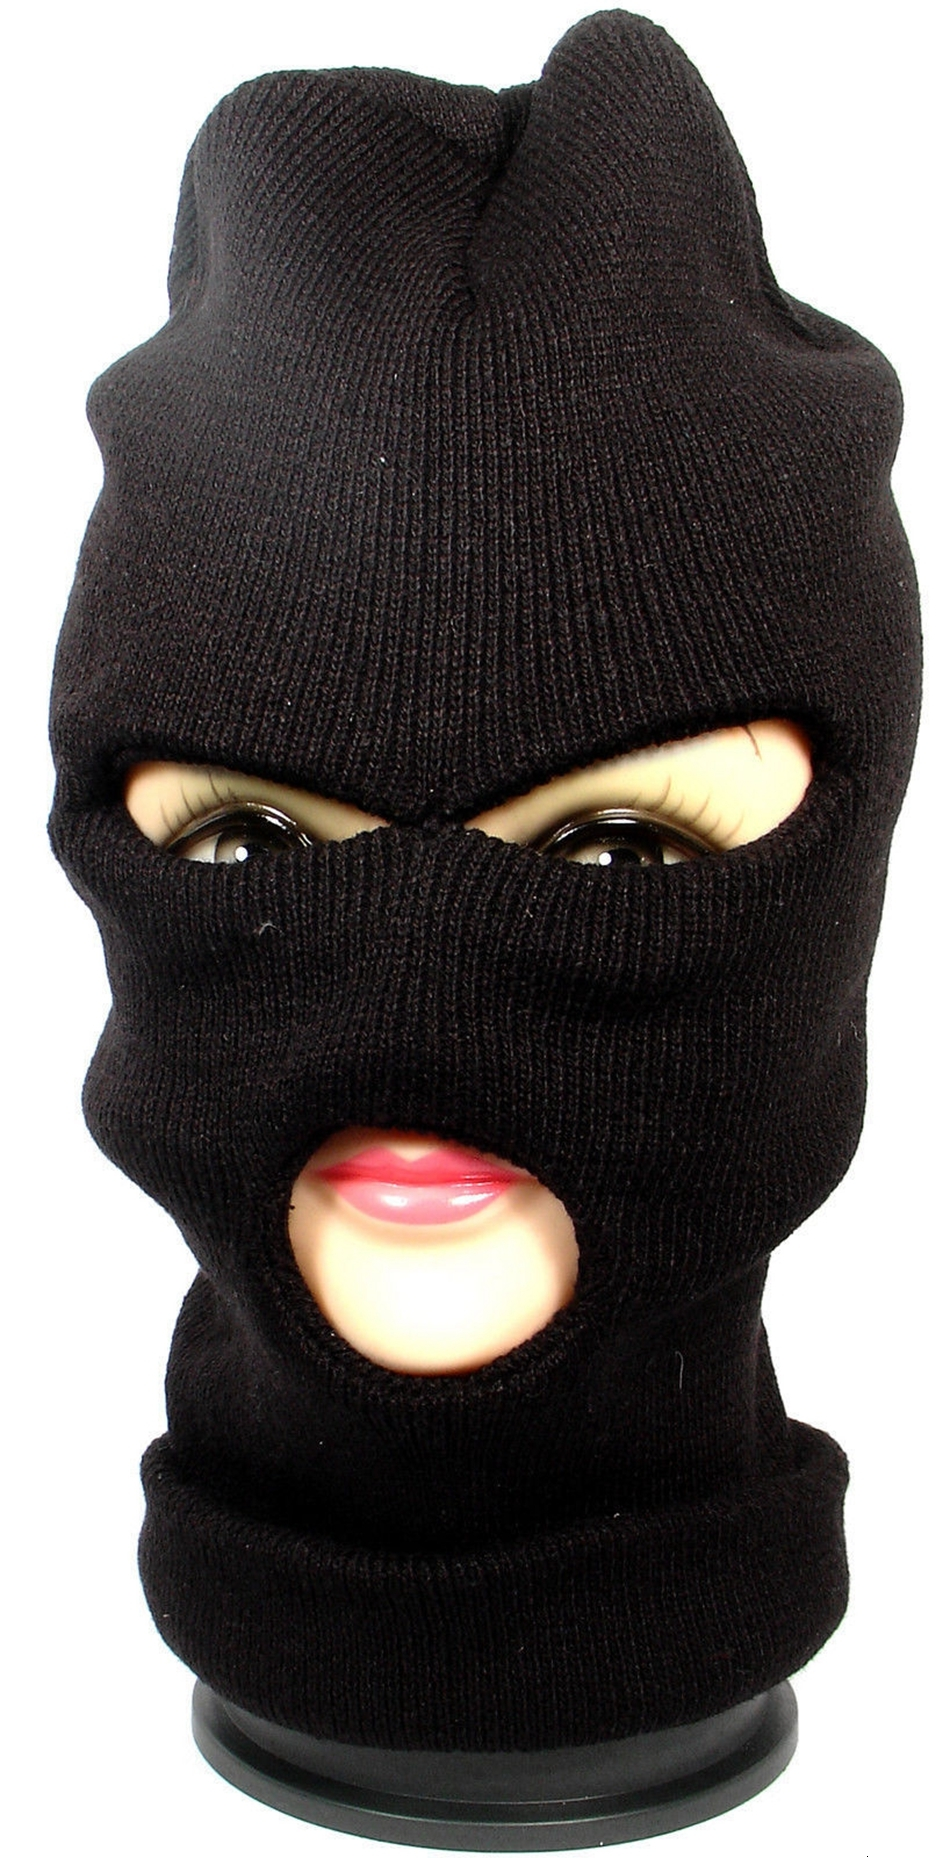 3 Hole Face Mask Beanie Winter Warm Ski Snowboard Hat Cap Wear Balaclava Full Face Cover Mask OOA2985